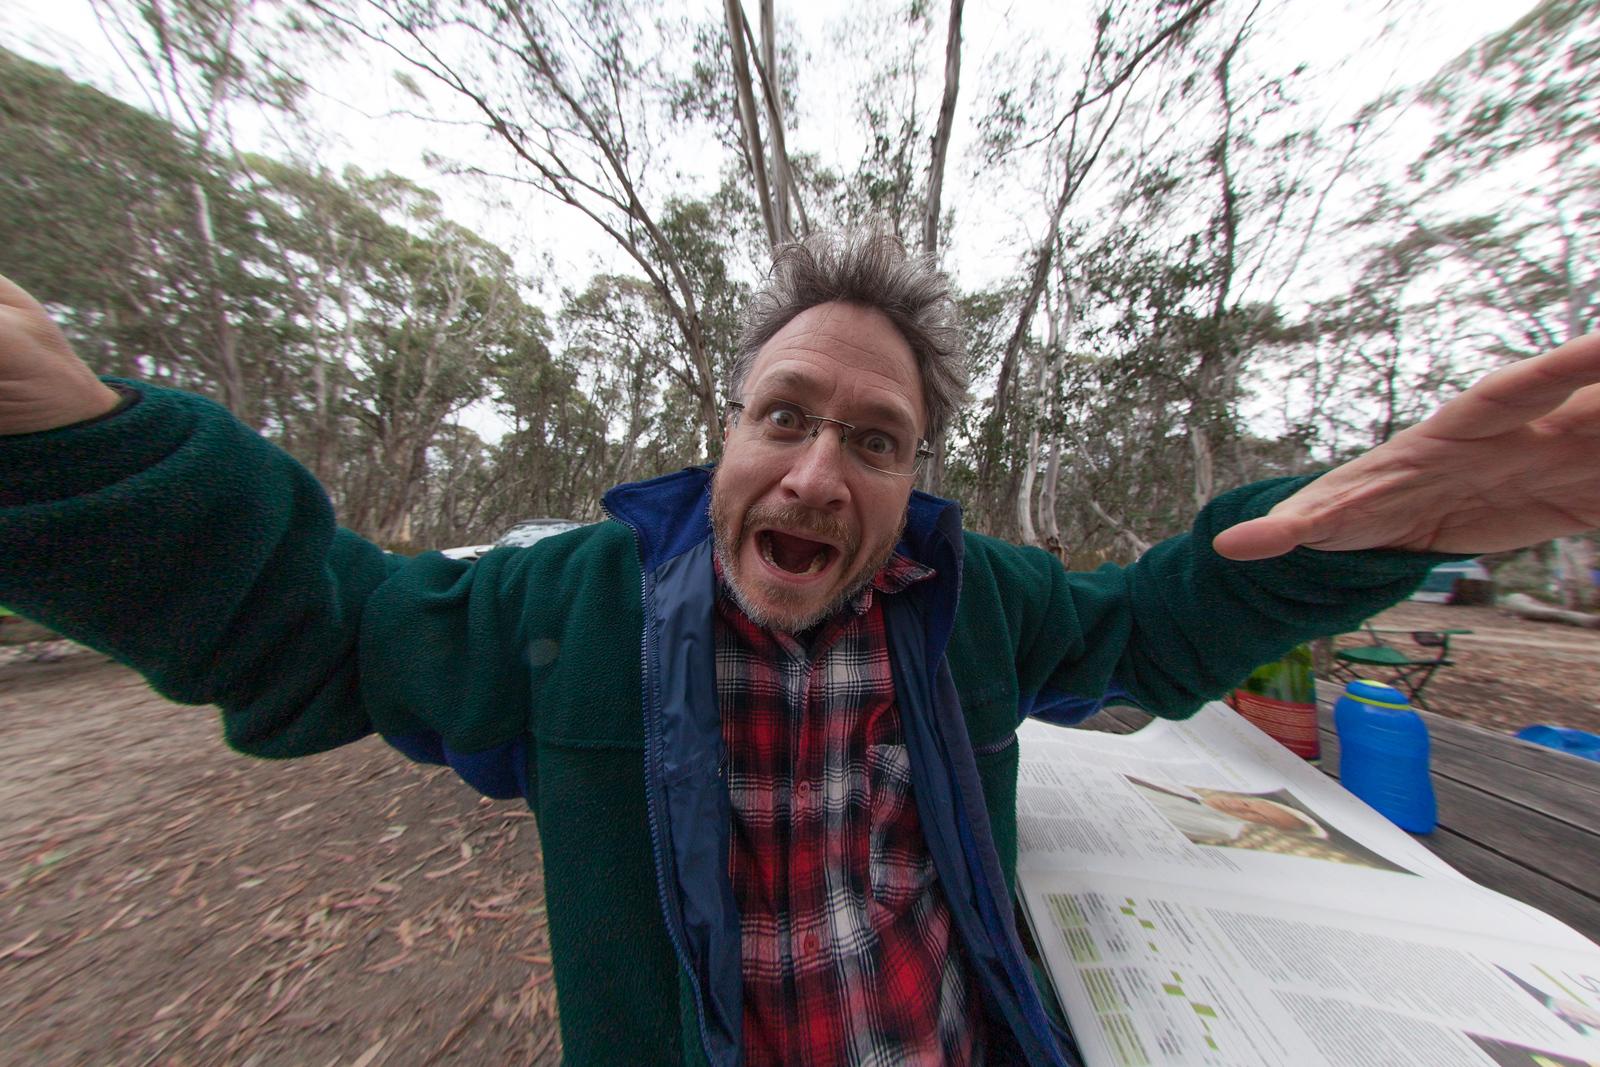 Phil Harrick in 2012 through a fisheye lens.